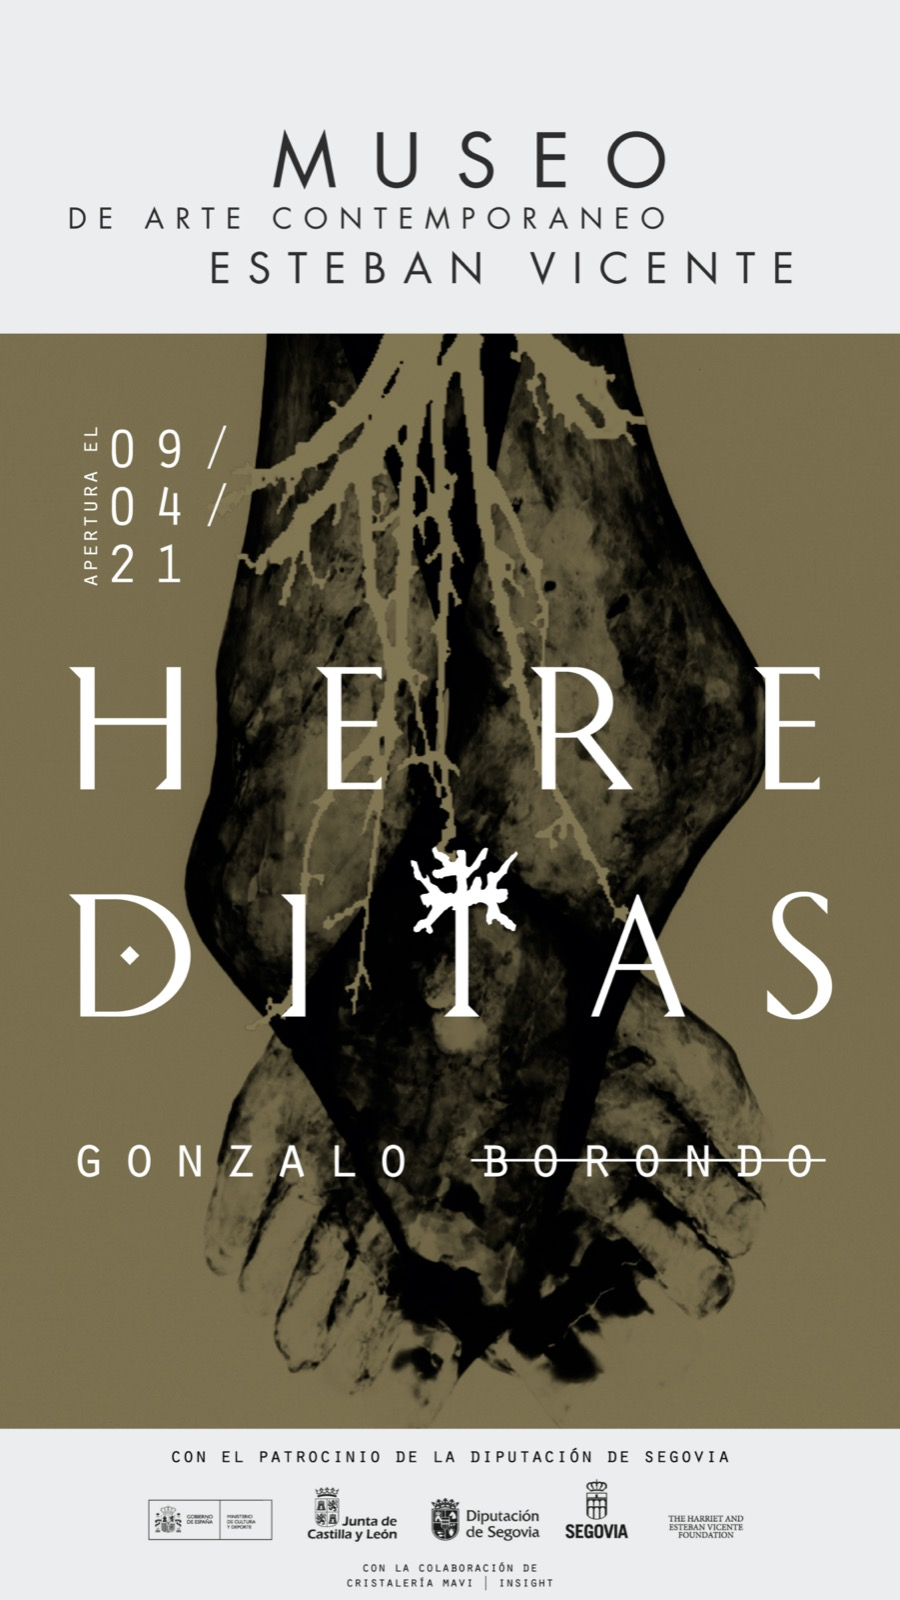 Hereditas de Gonzalo Borondo